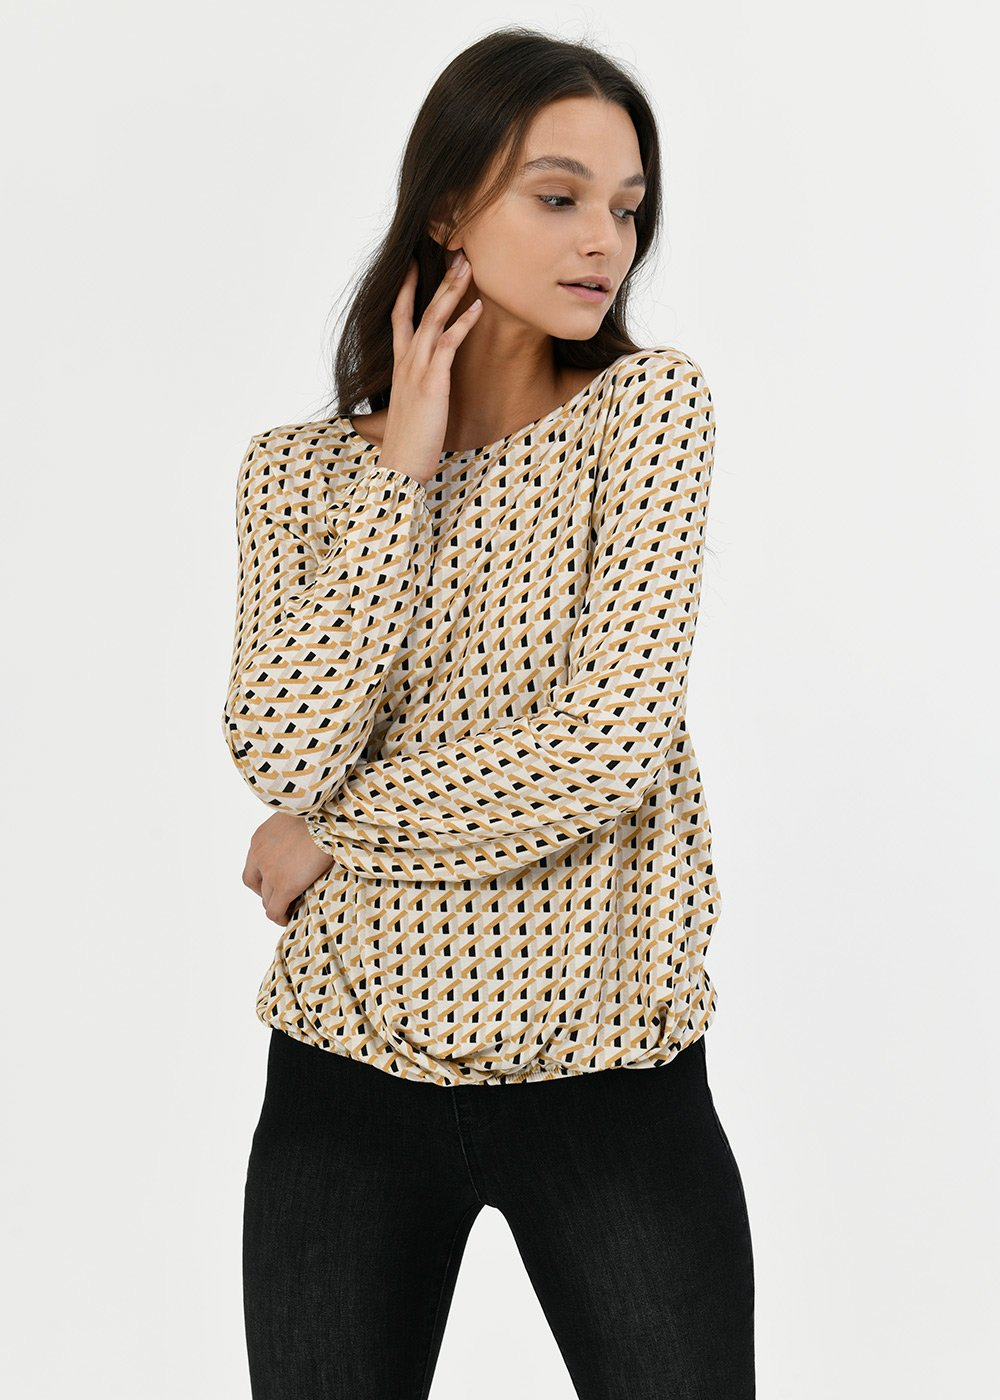 Anna egg-shaped T-shirt - Black /  Honey Multi - Woman